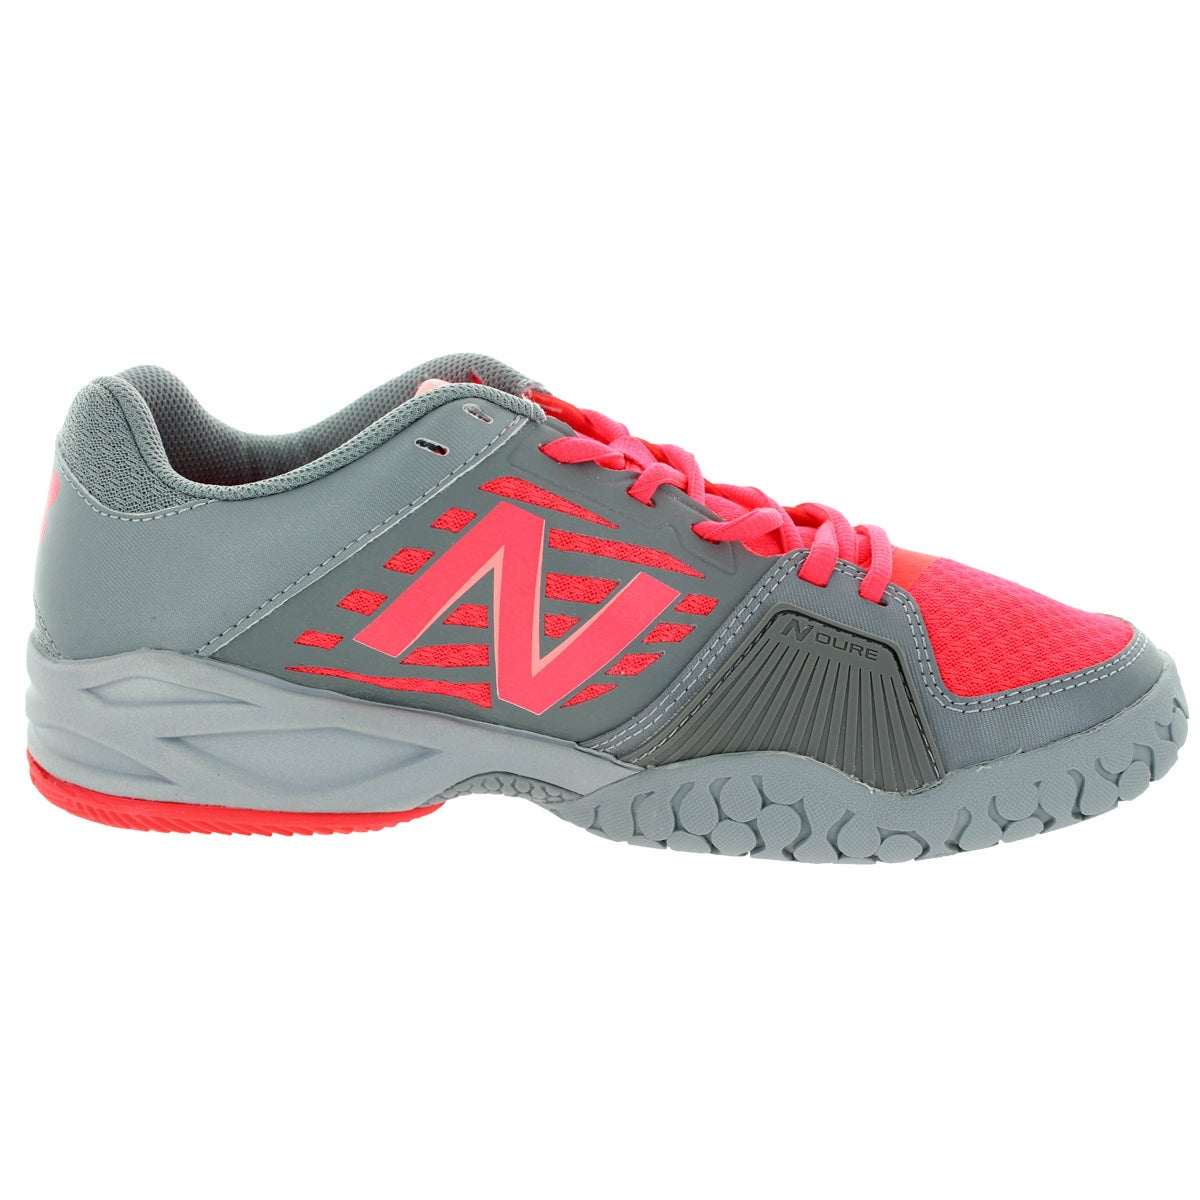 New Balance Women's 896 Coral PinkGrey Tennis Shoe